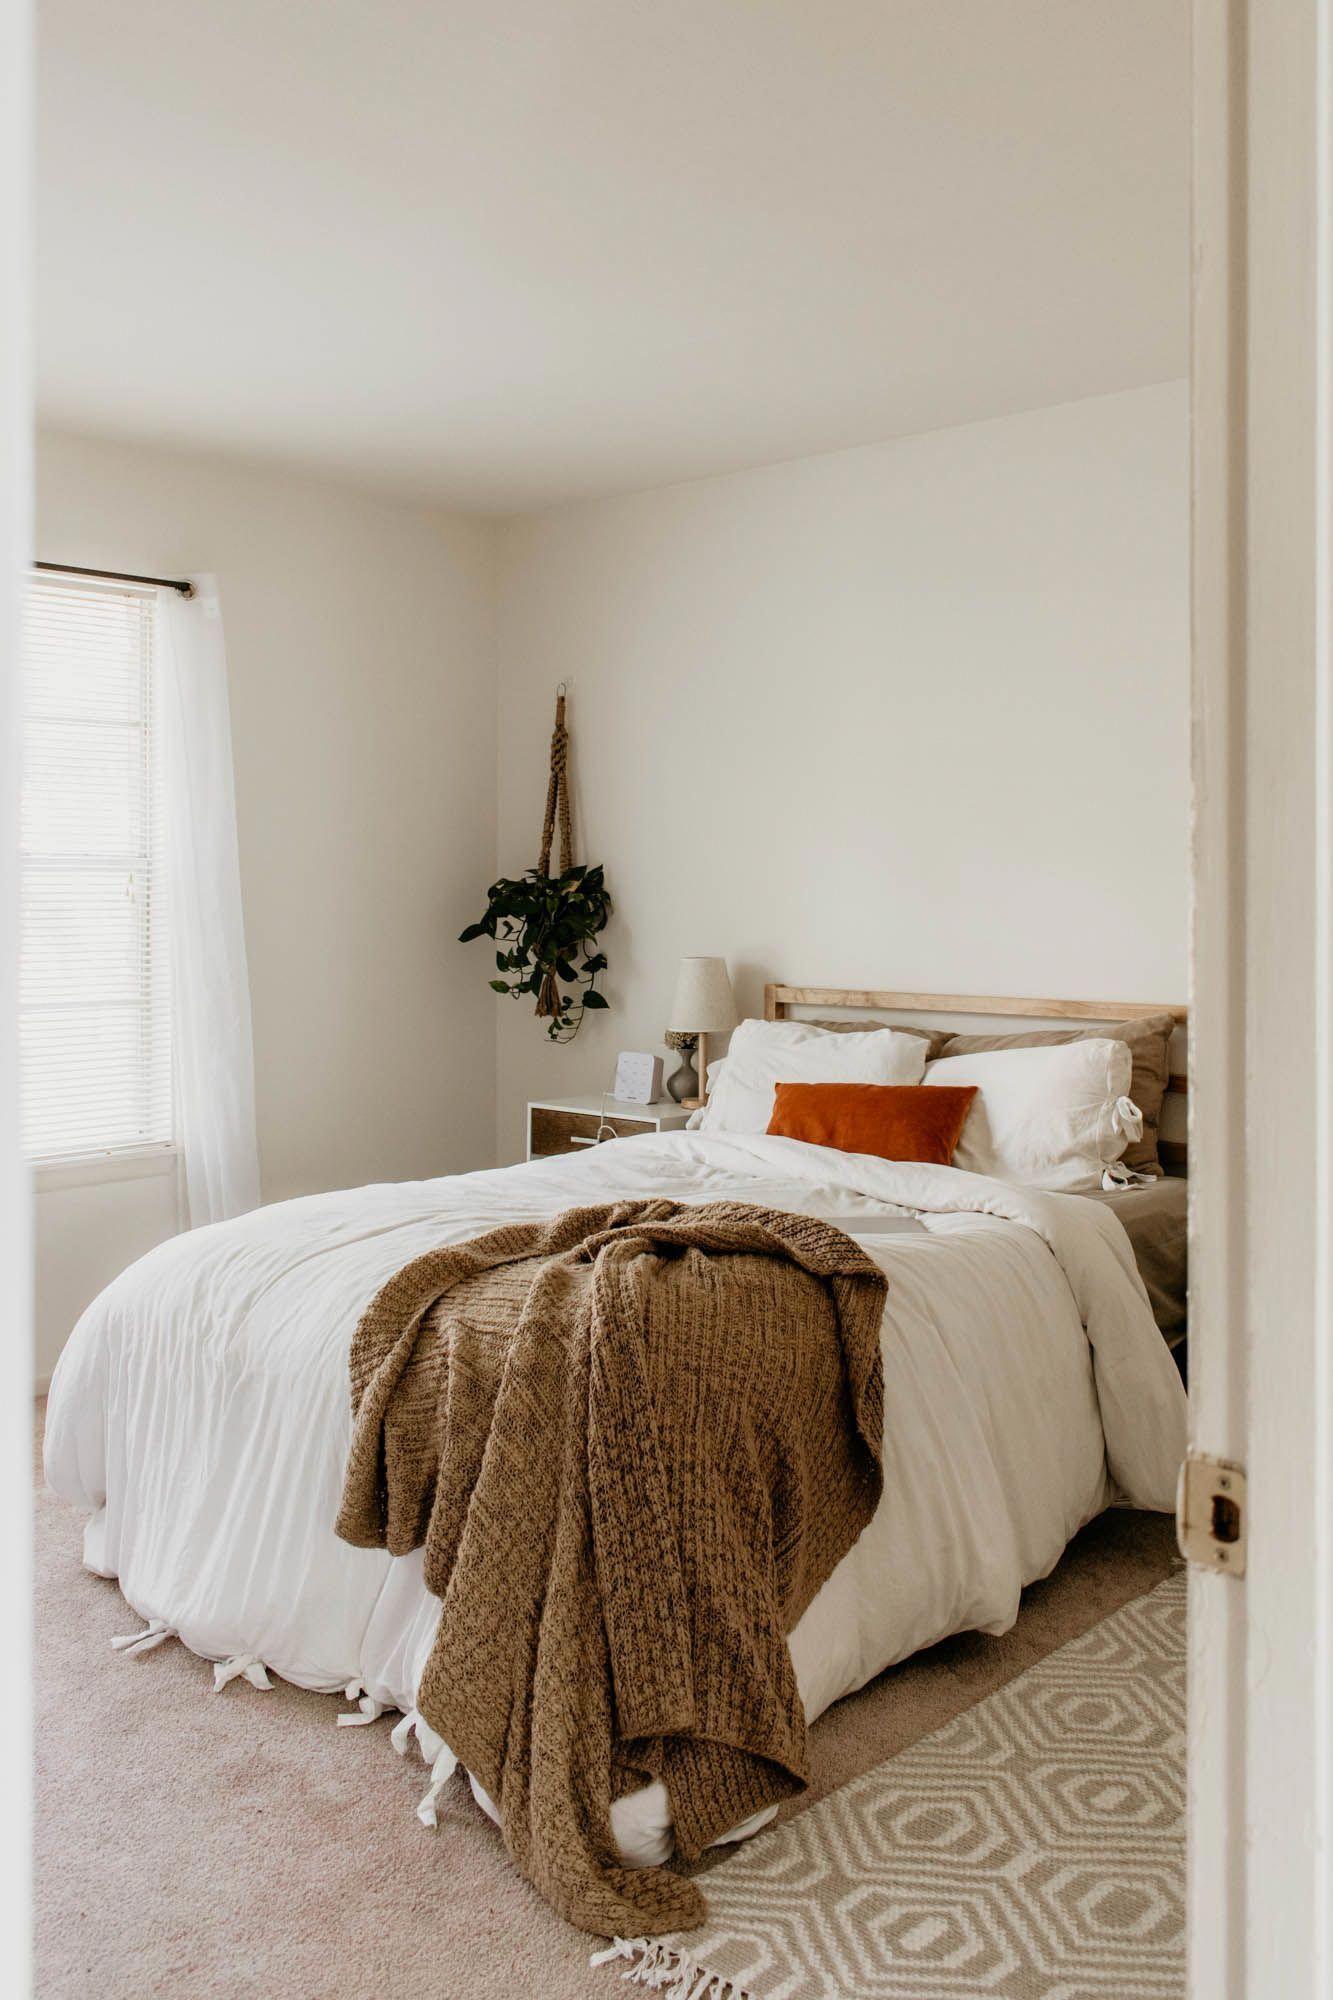 Read more about bedroom decor bedroomdecor Scandinavian